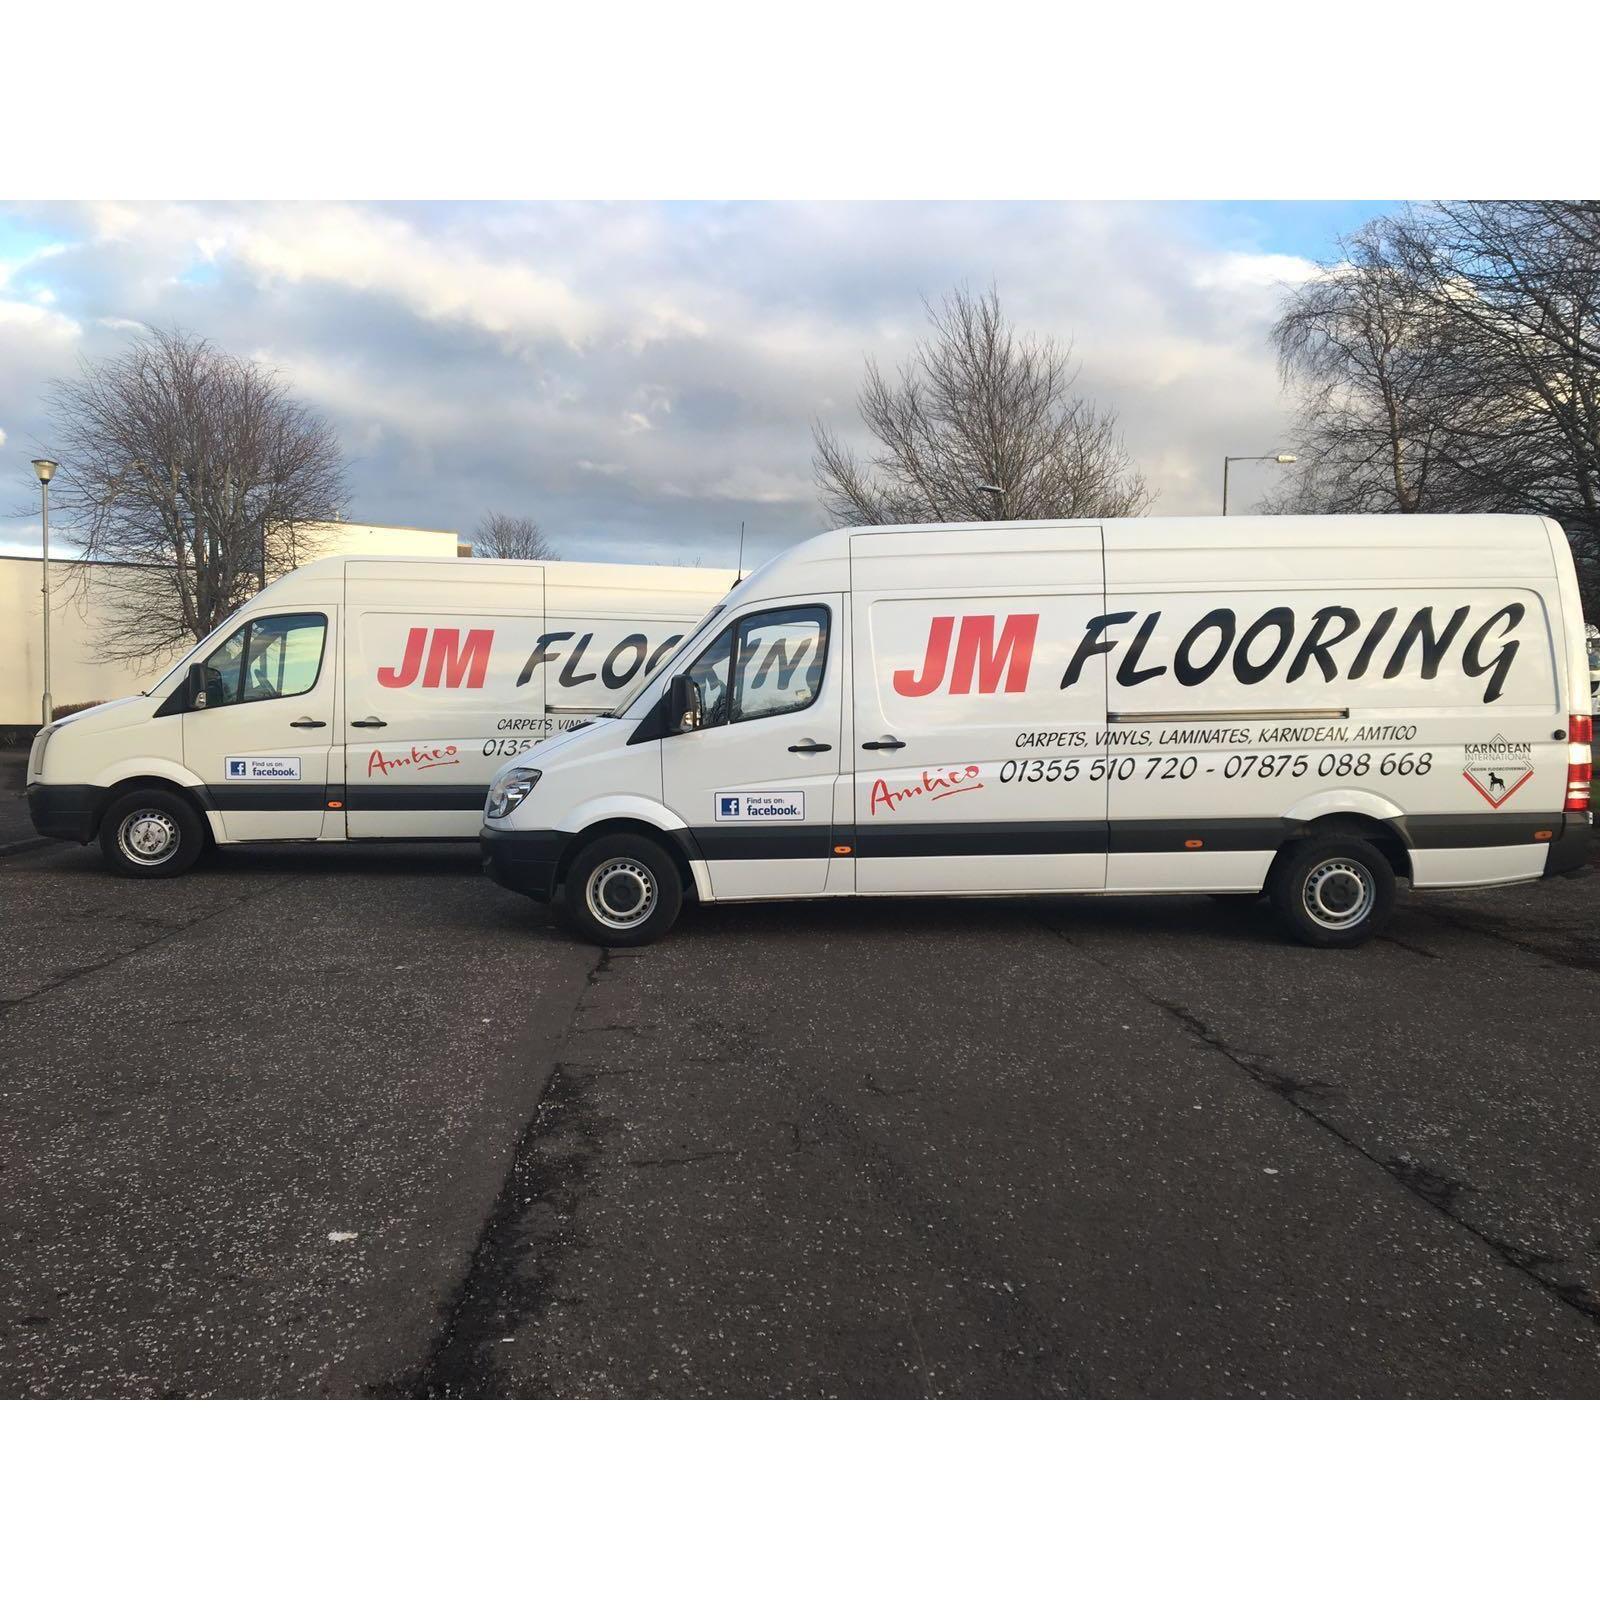 JM Flooring - Glasgow, Lanarkshire G74 3ST - 07875 088668   ShowMeLocal.com